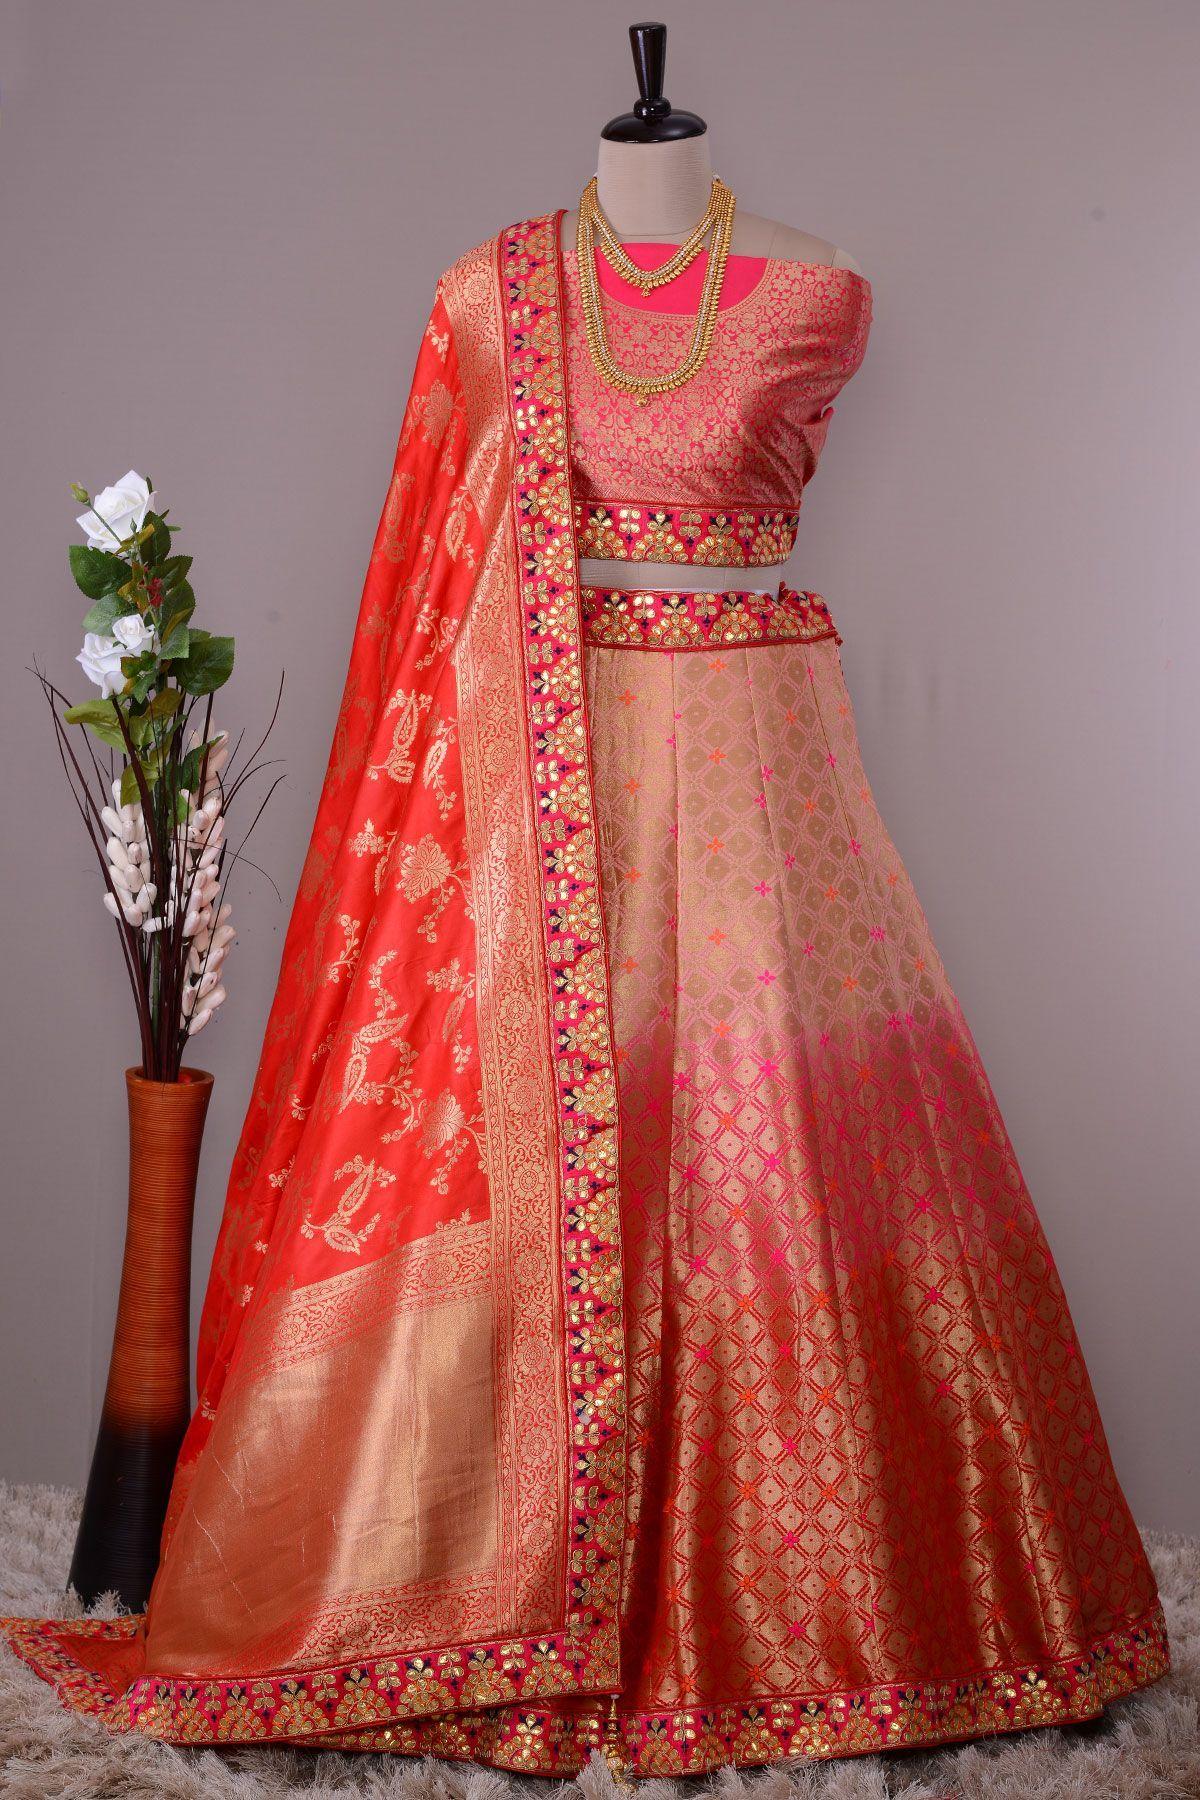 Buy Shaded Pink Red Zari Woven Banarasi Silk Bridesmaids Lehenga Online Banarasi Lehenga Lehenga Online Lehenga